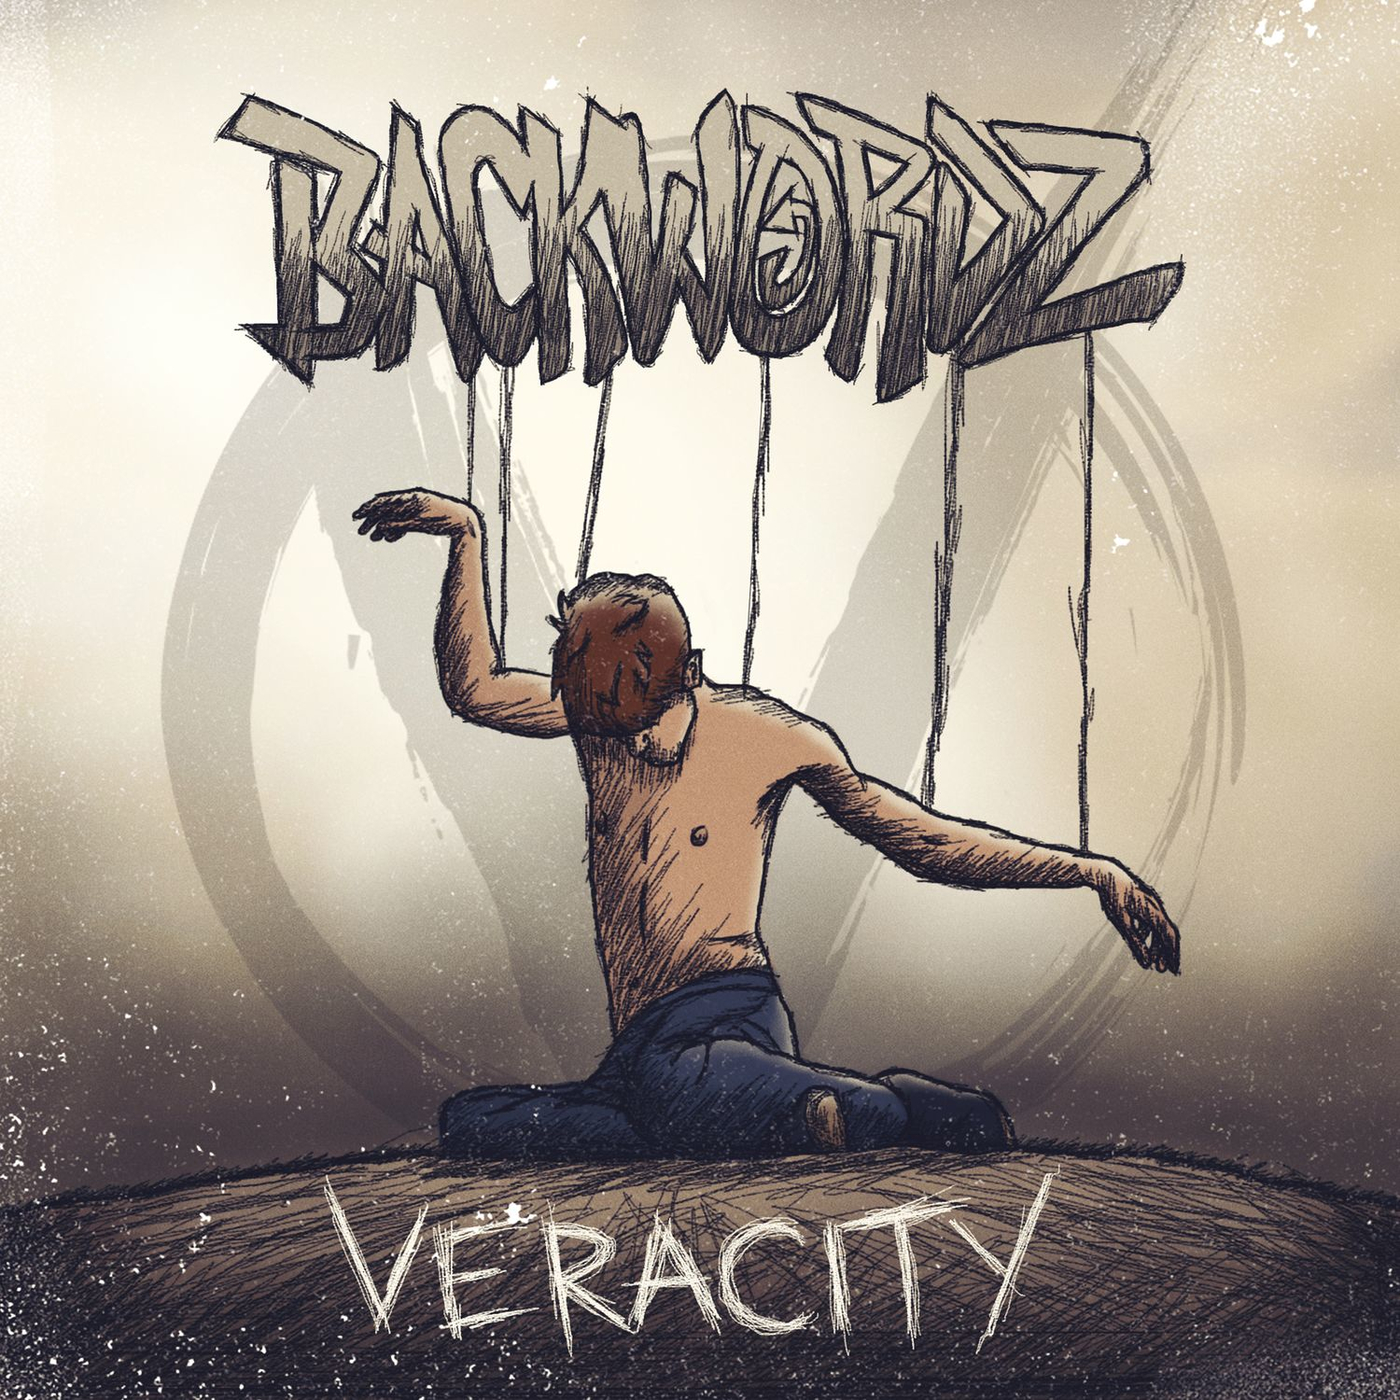 BackWordz - Veracity (2017)